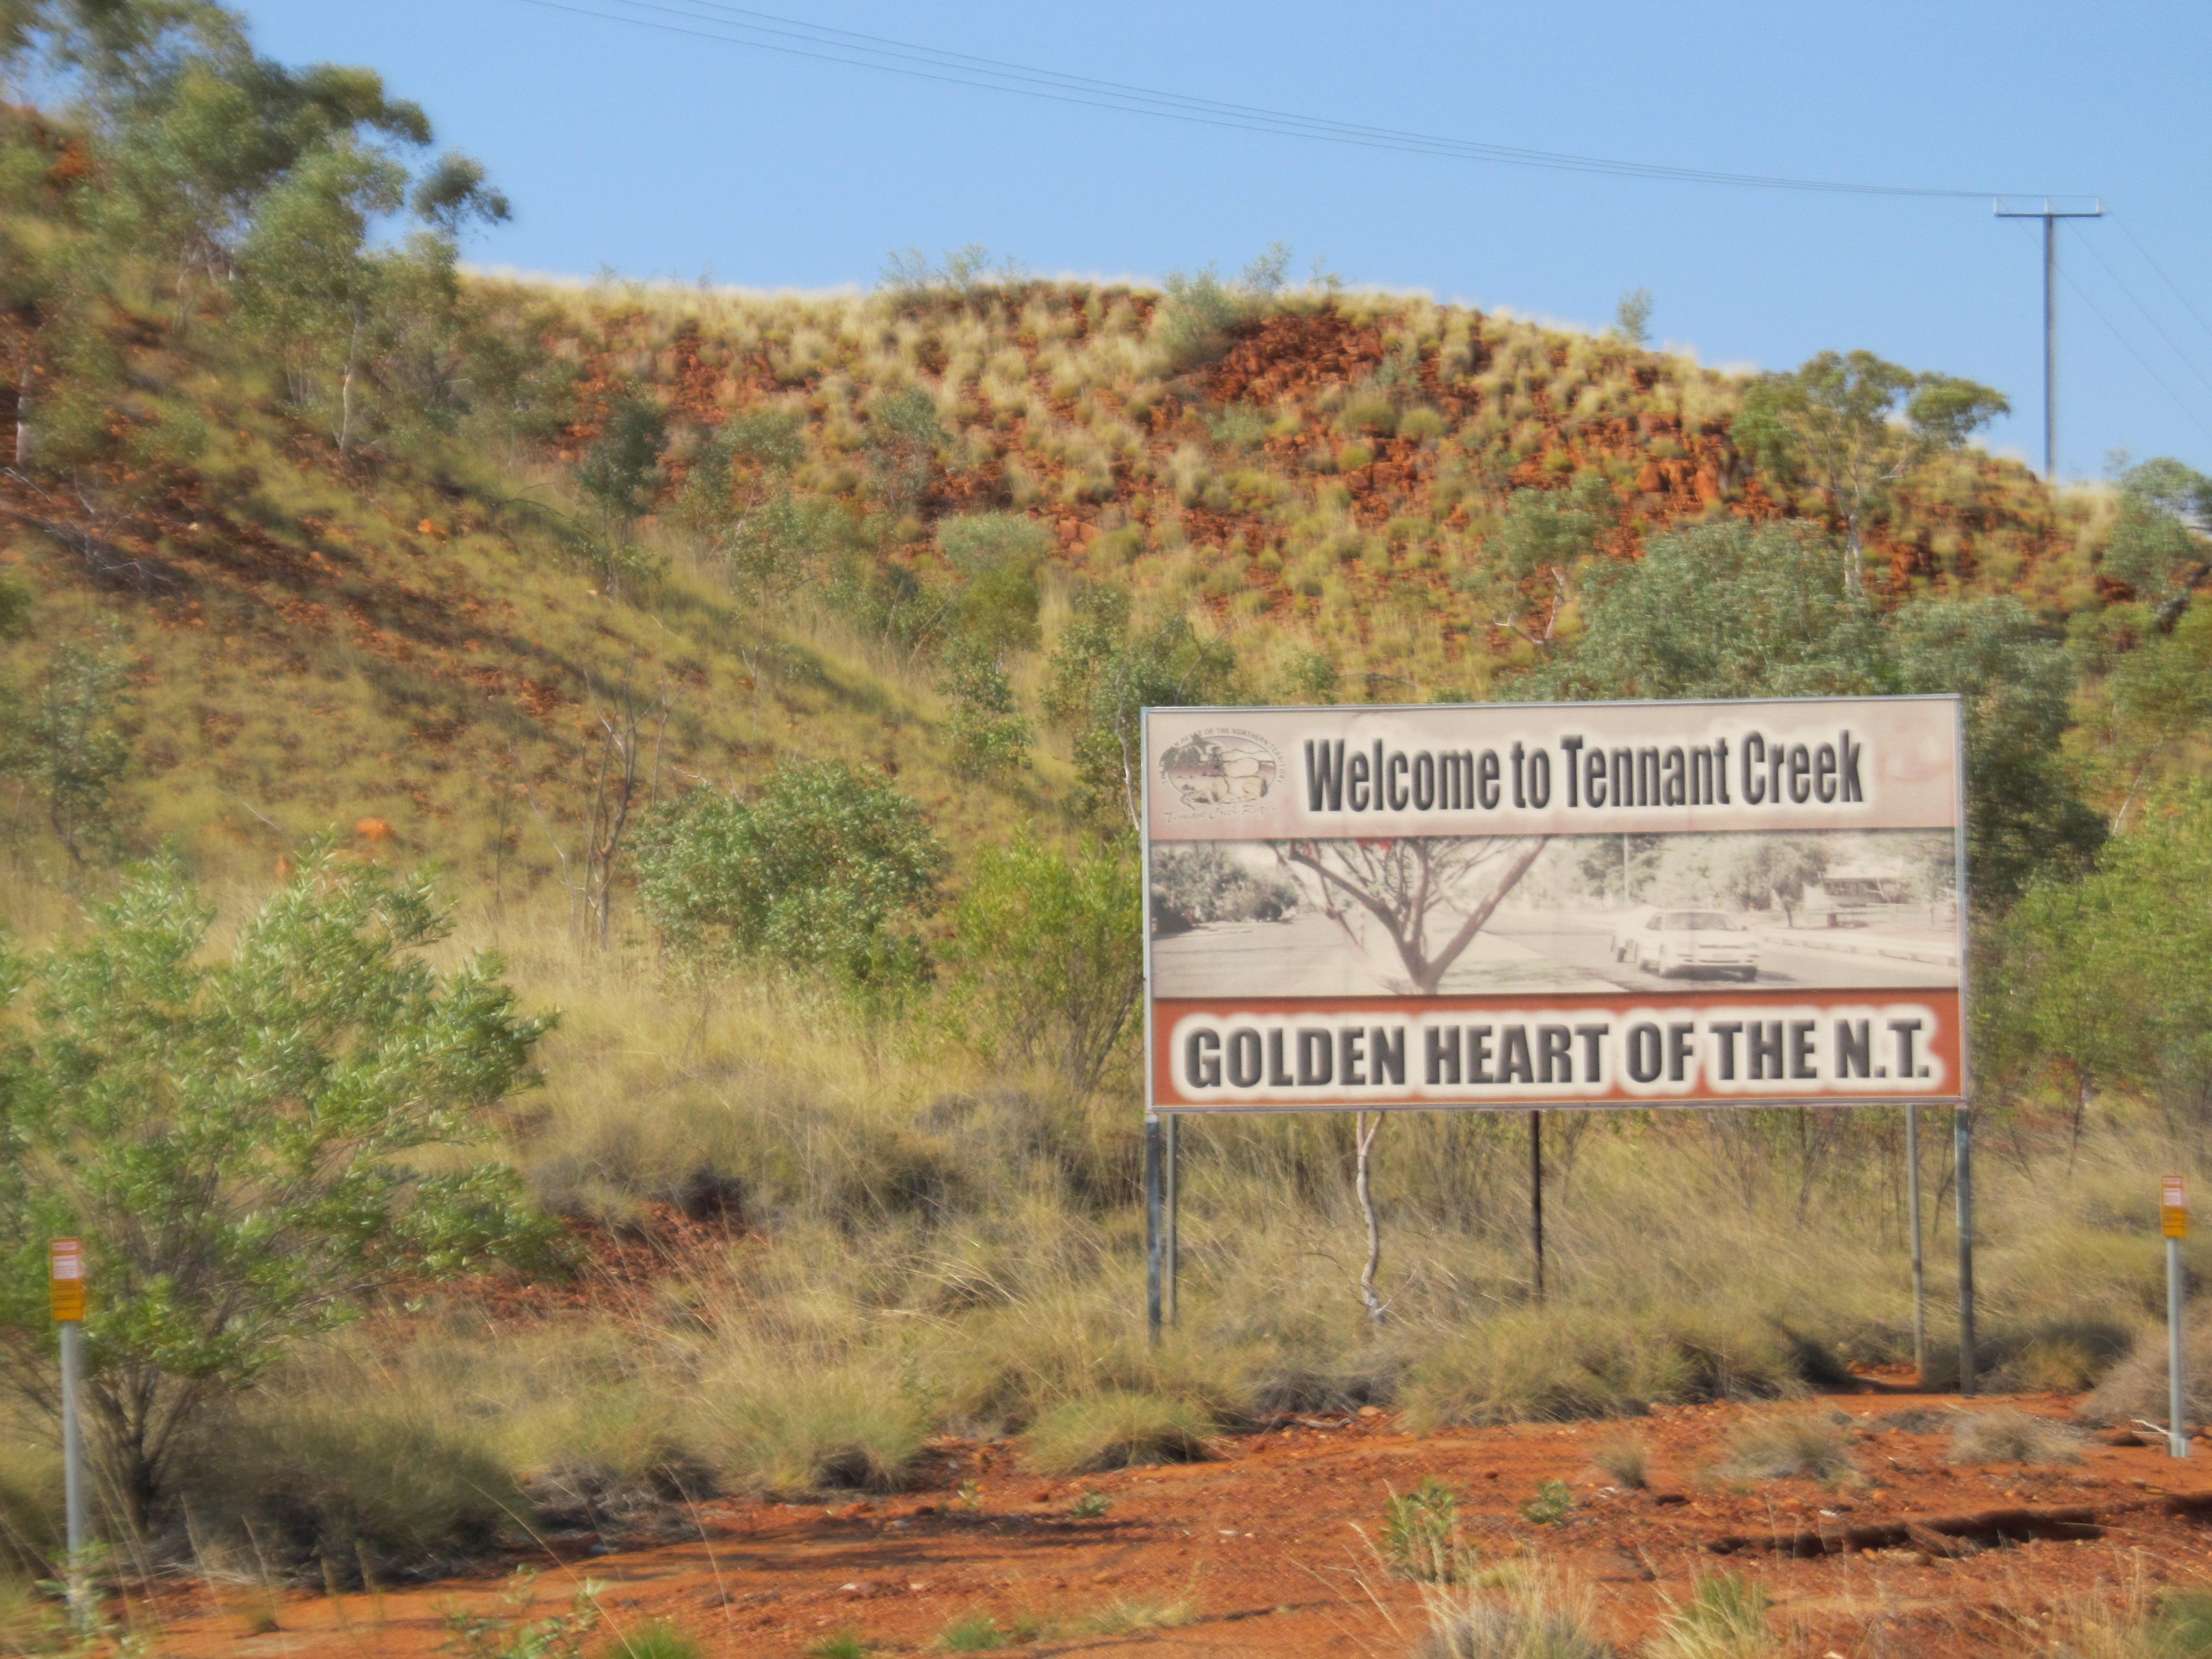 Tennant Creek Australia  city photos gallery : Tennant Creek